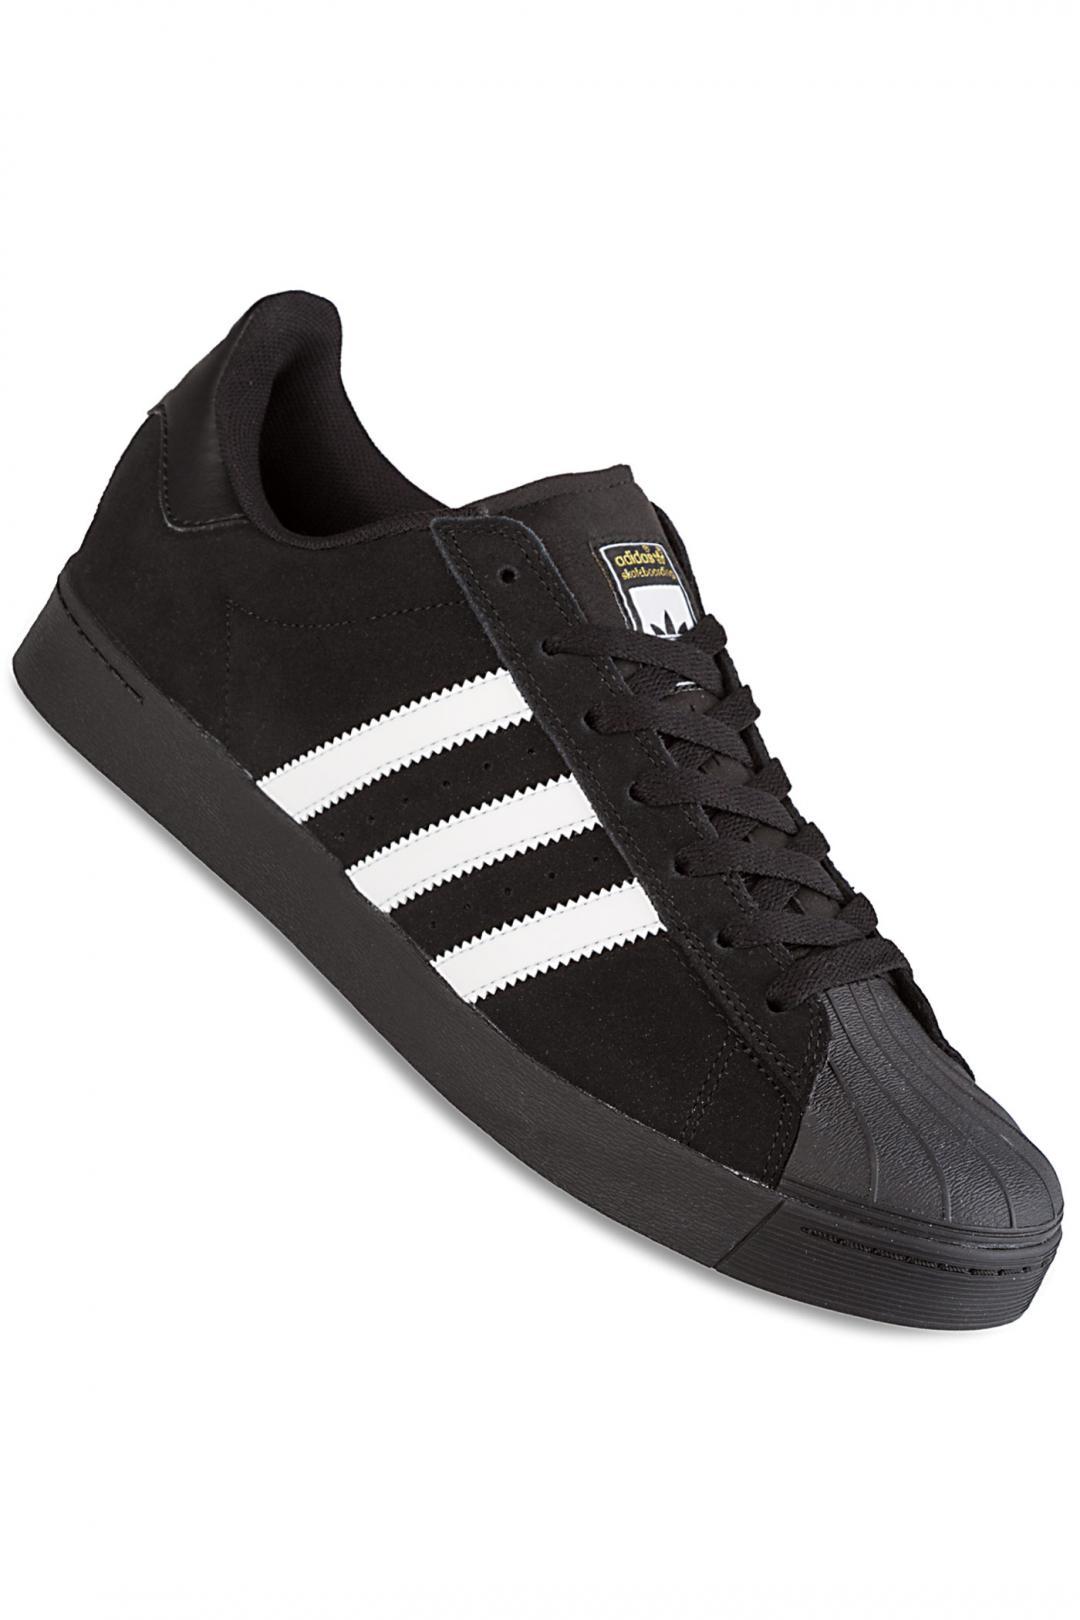 Uomo adidas Superstar Vulc ADV black white black | Scarpe da skate